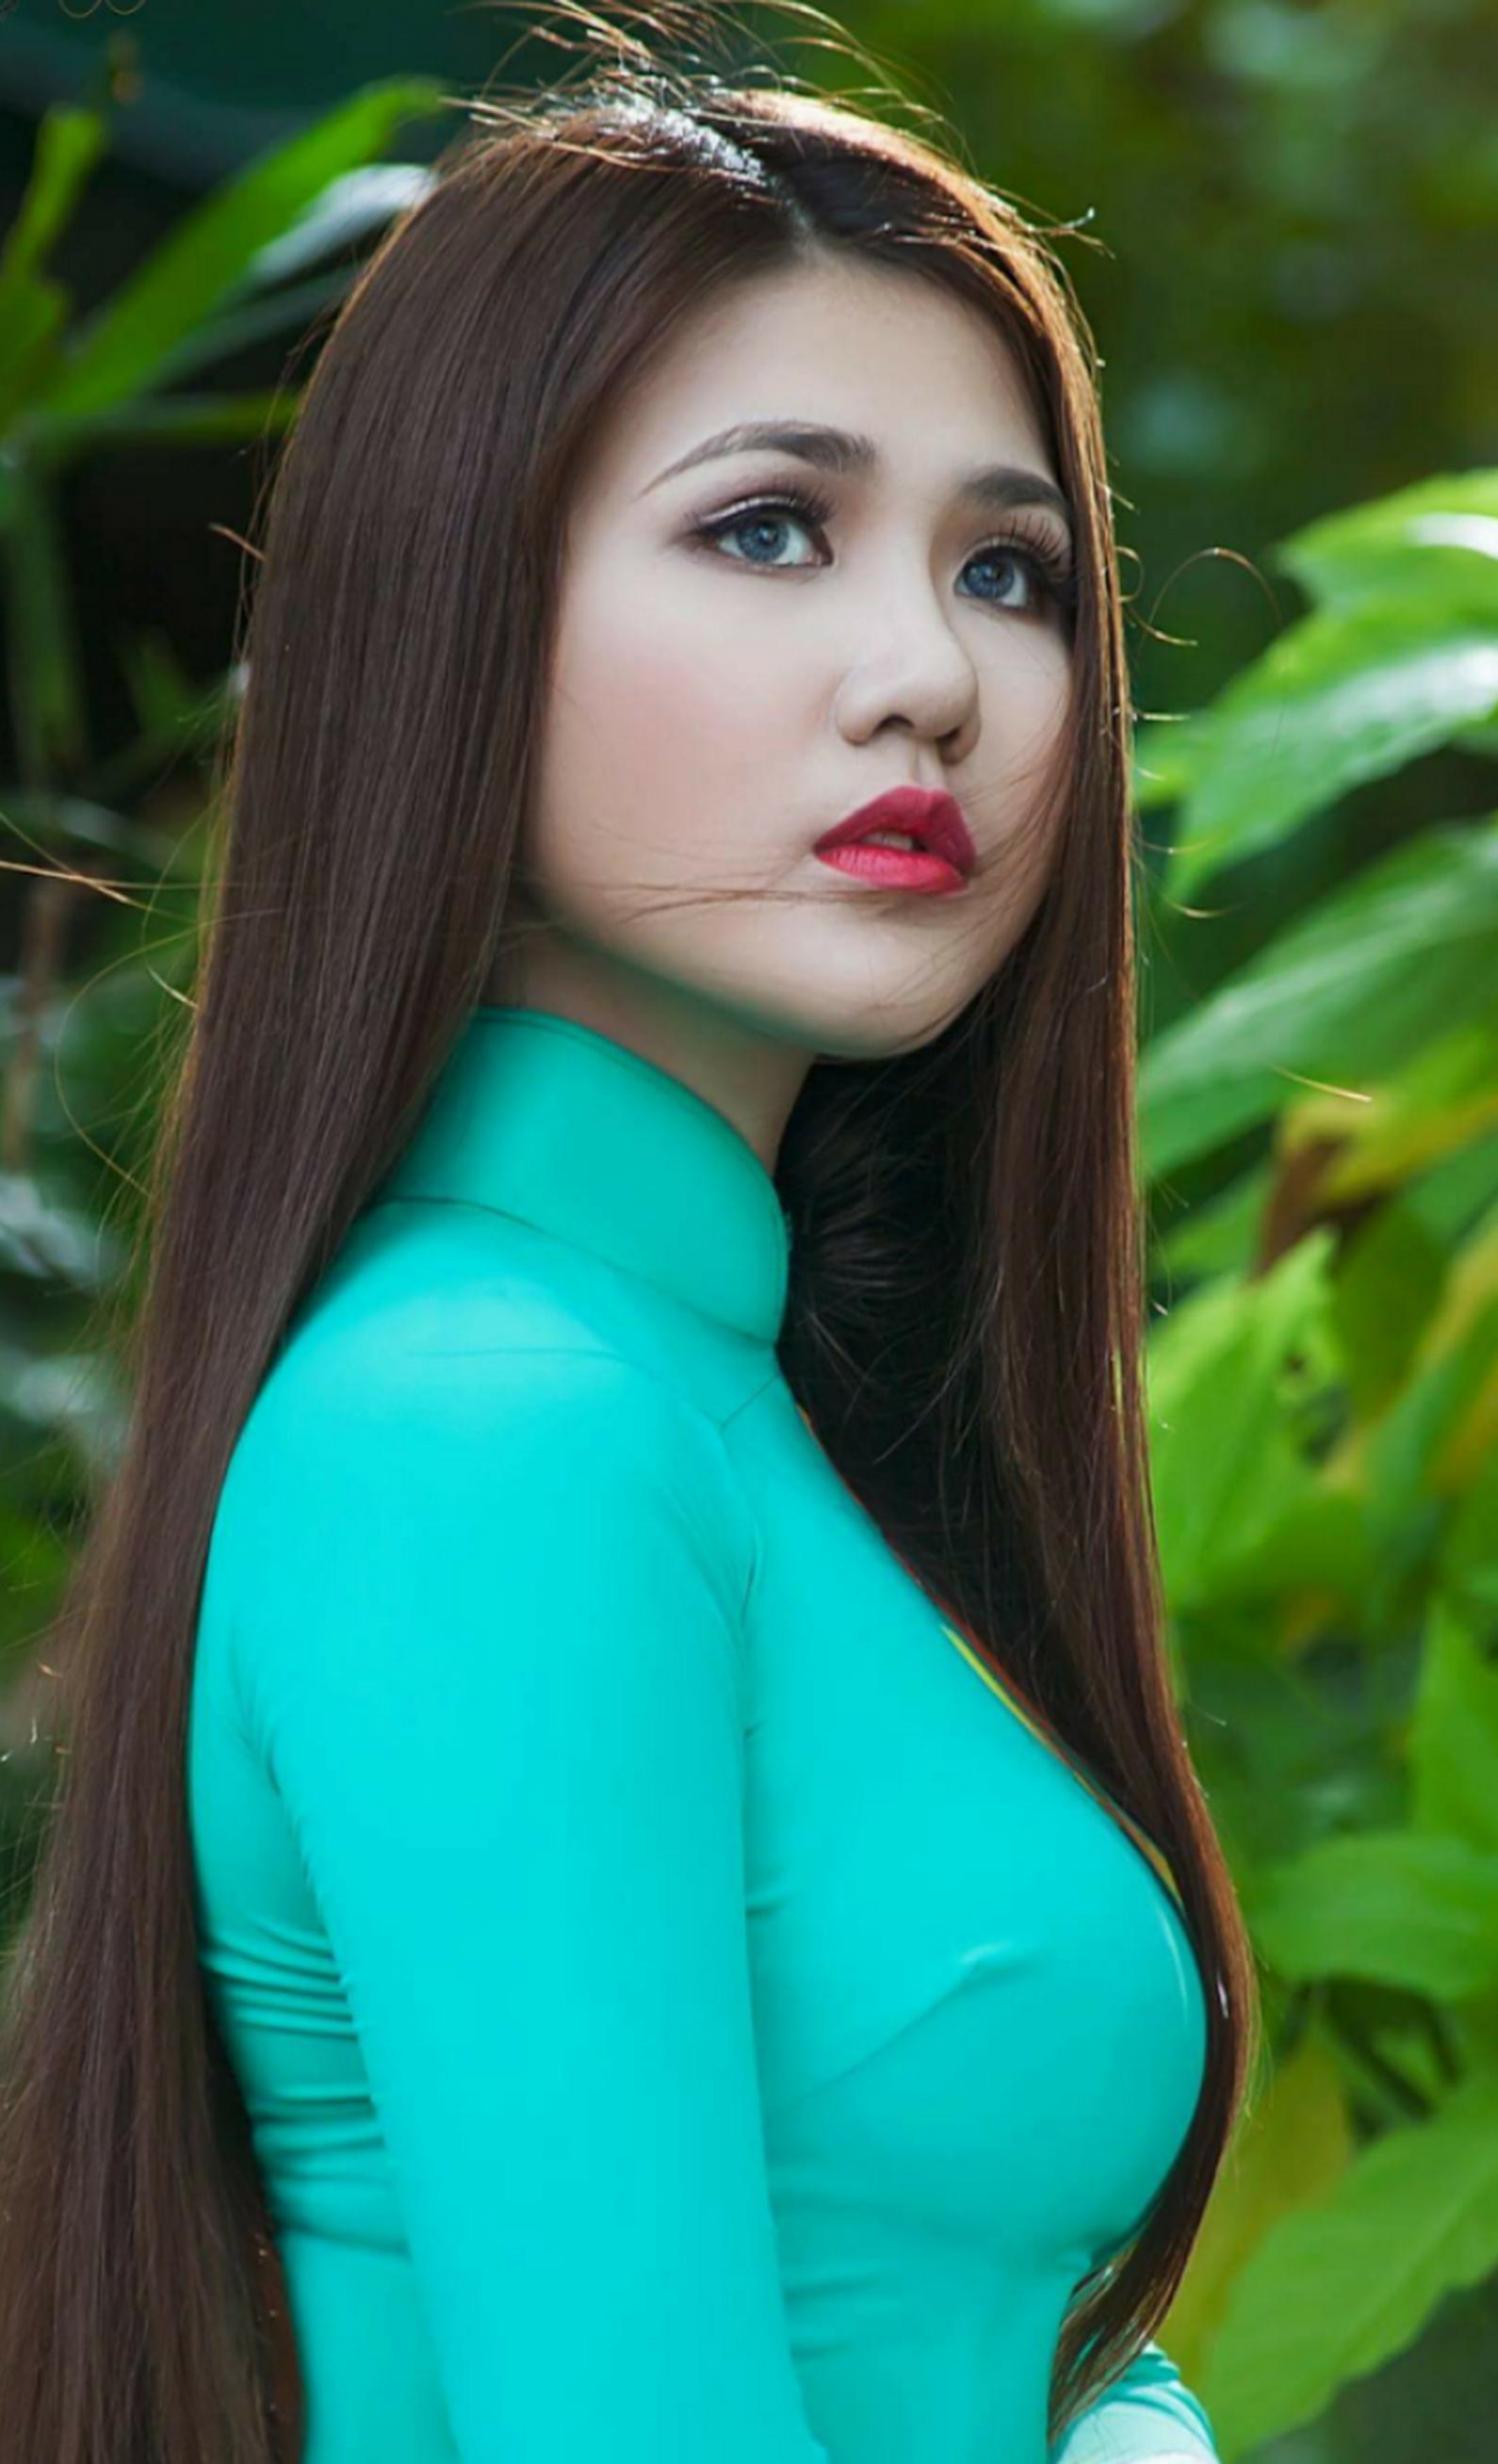 from Nolan beautiful nude girl vietnamese